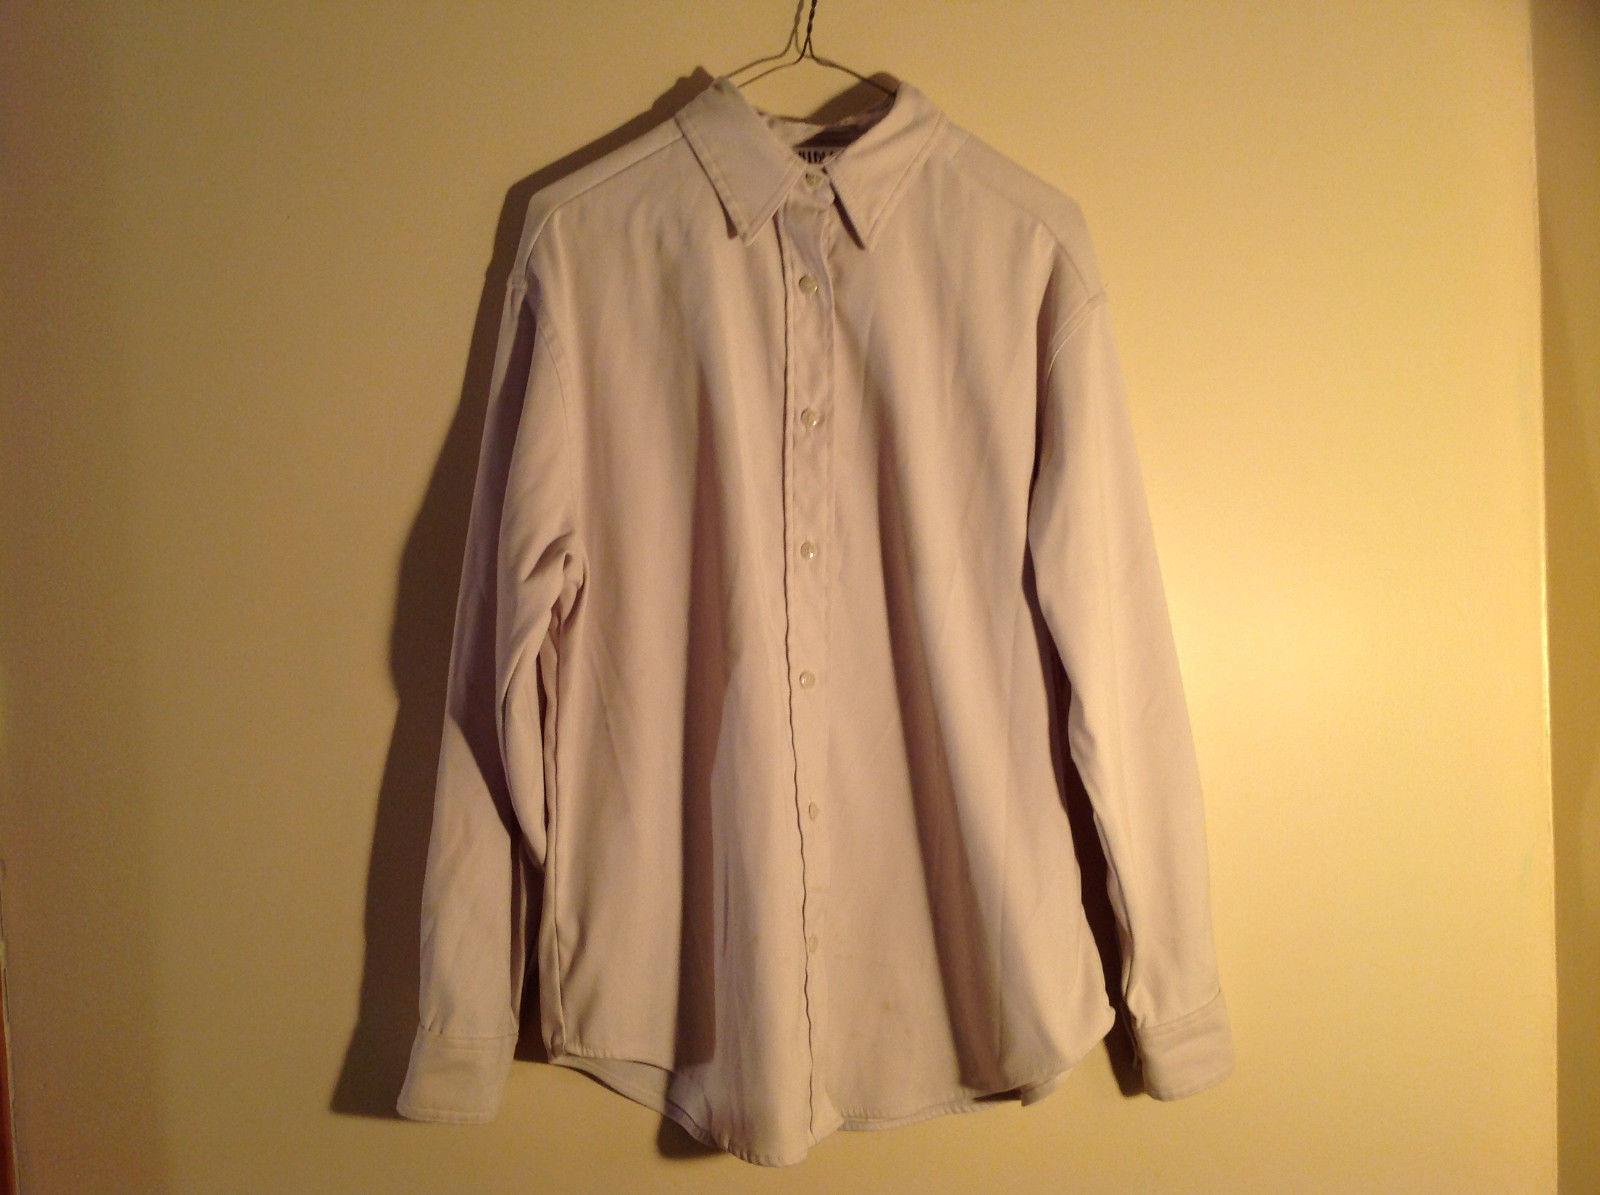 Bill Blass Jeans Tan Long Sleeve Button Up Shirt Heavy Material Size Small